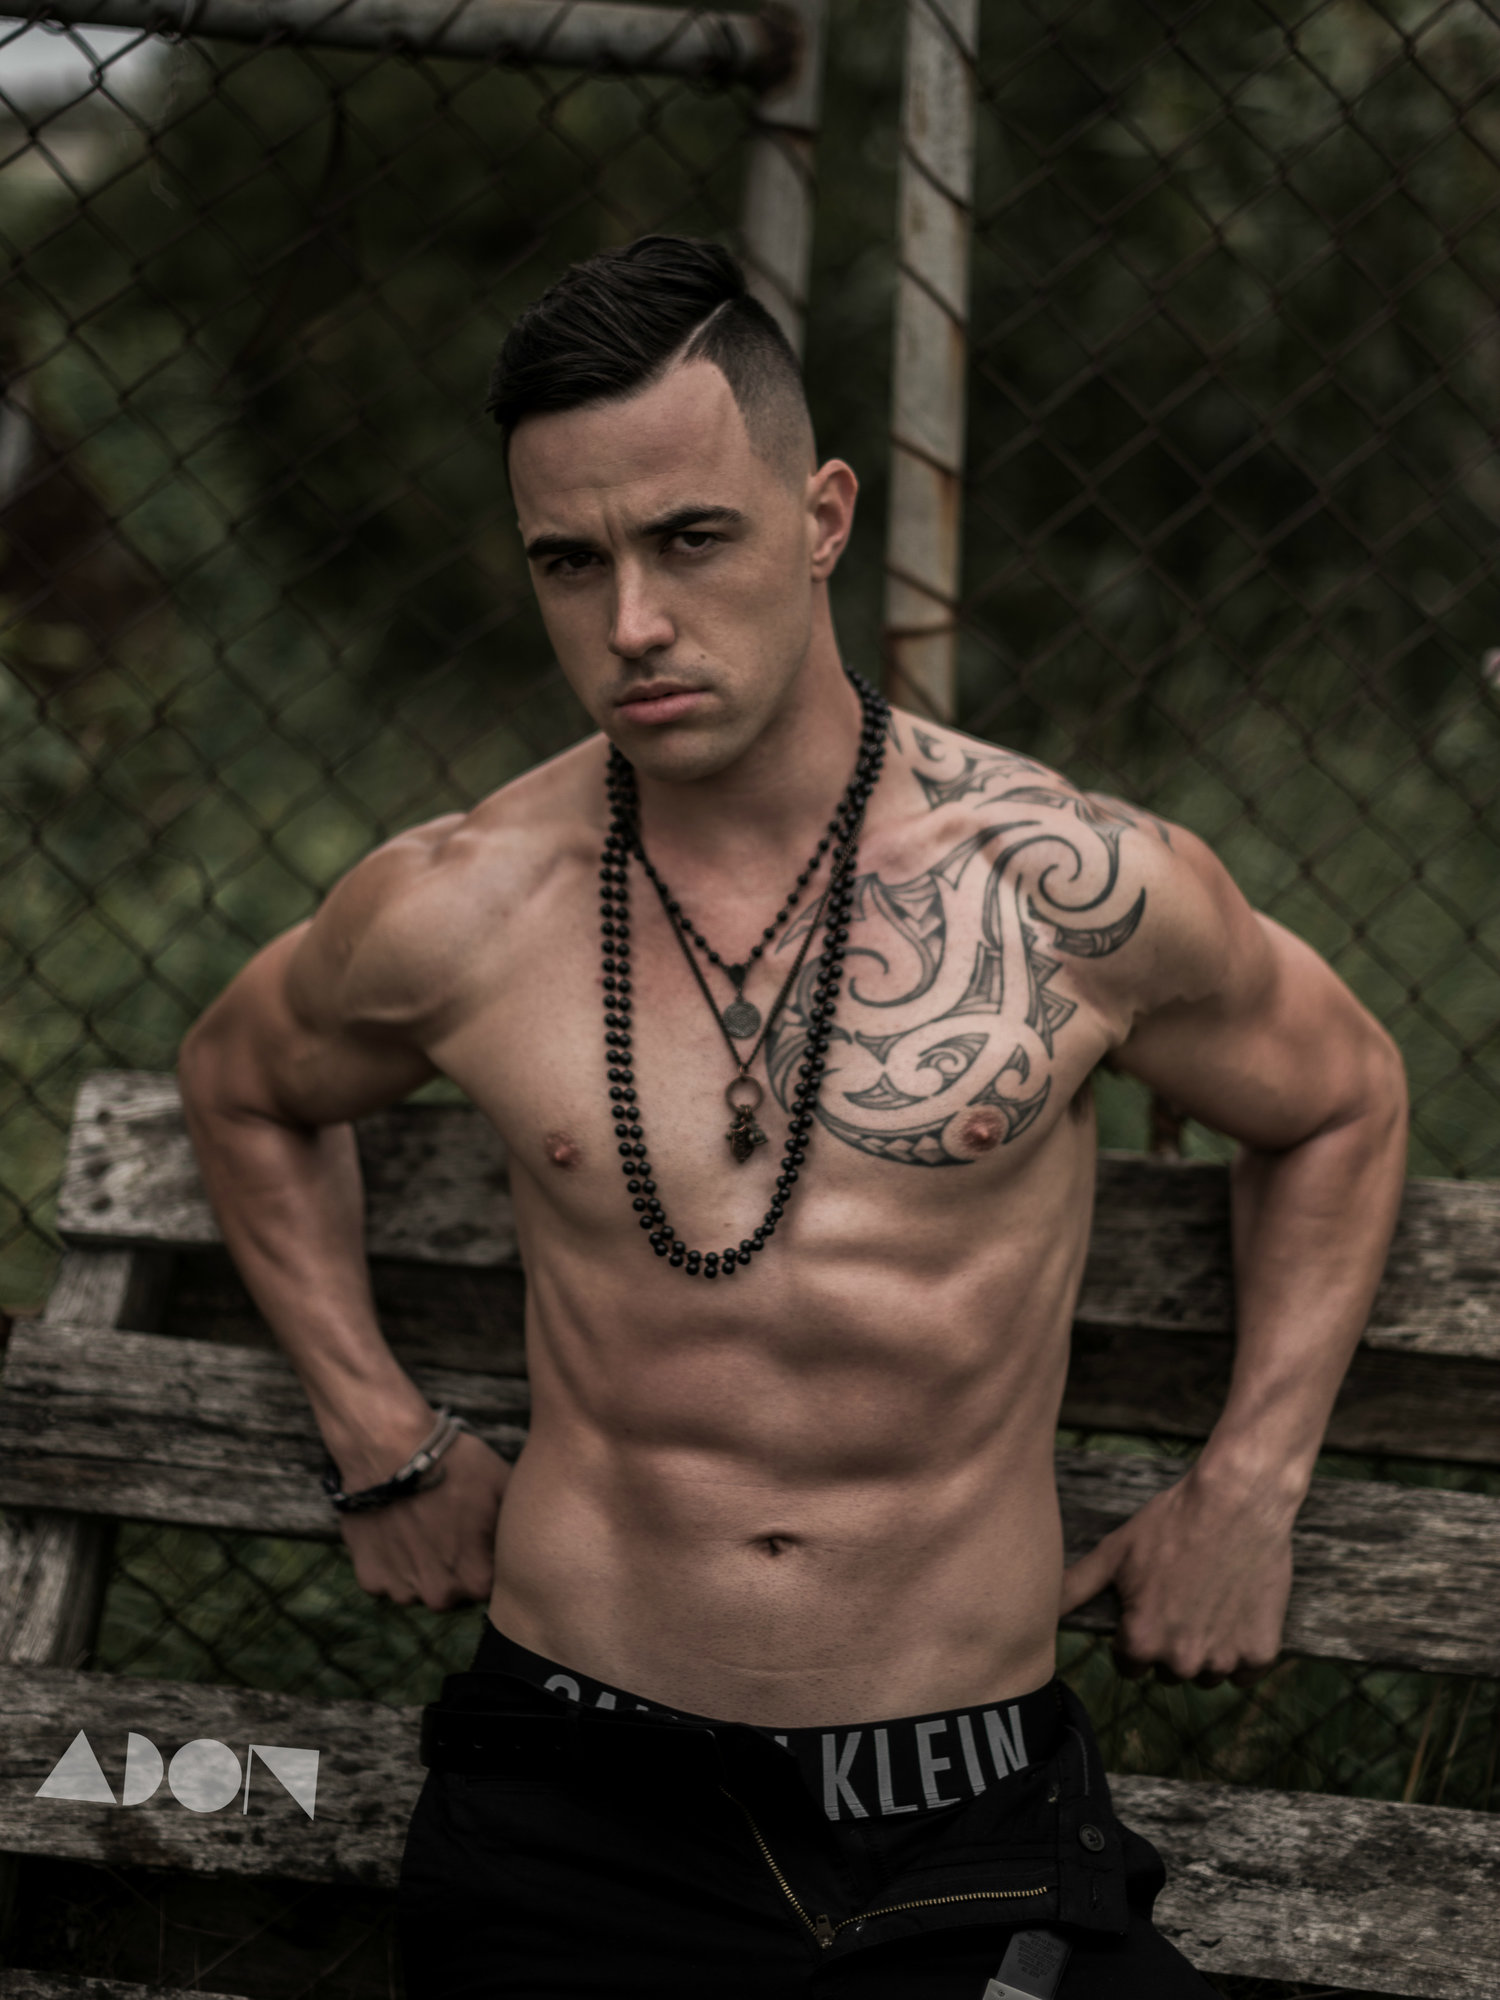 Adon Exclusive: Model Ric Prangnell By John Carlos Ramos